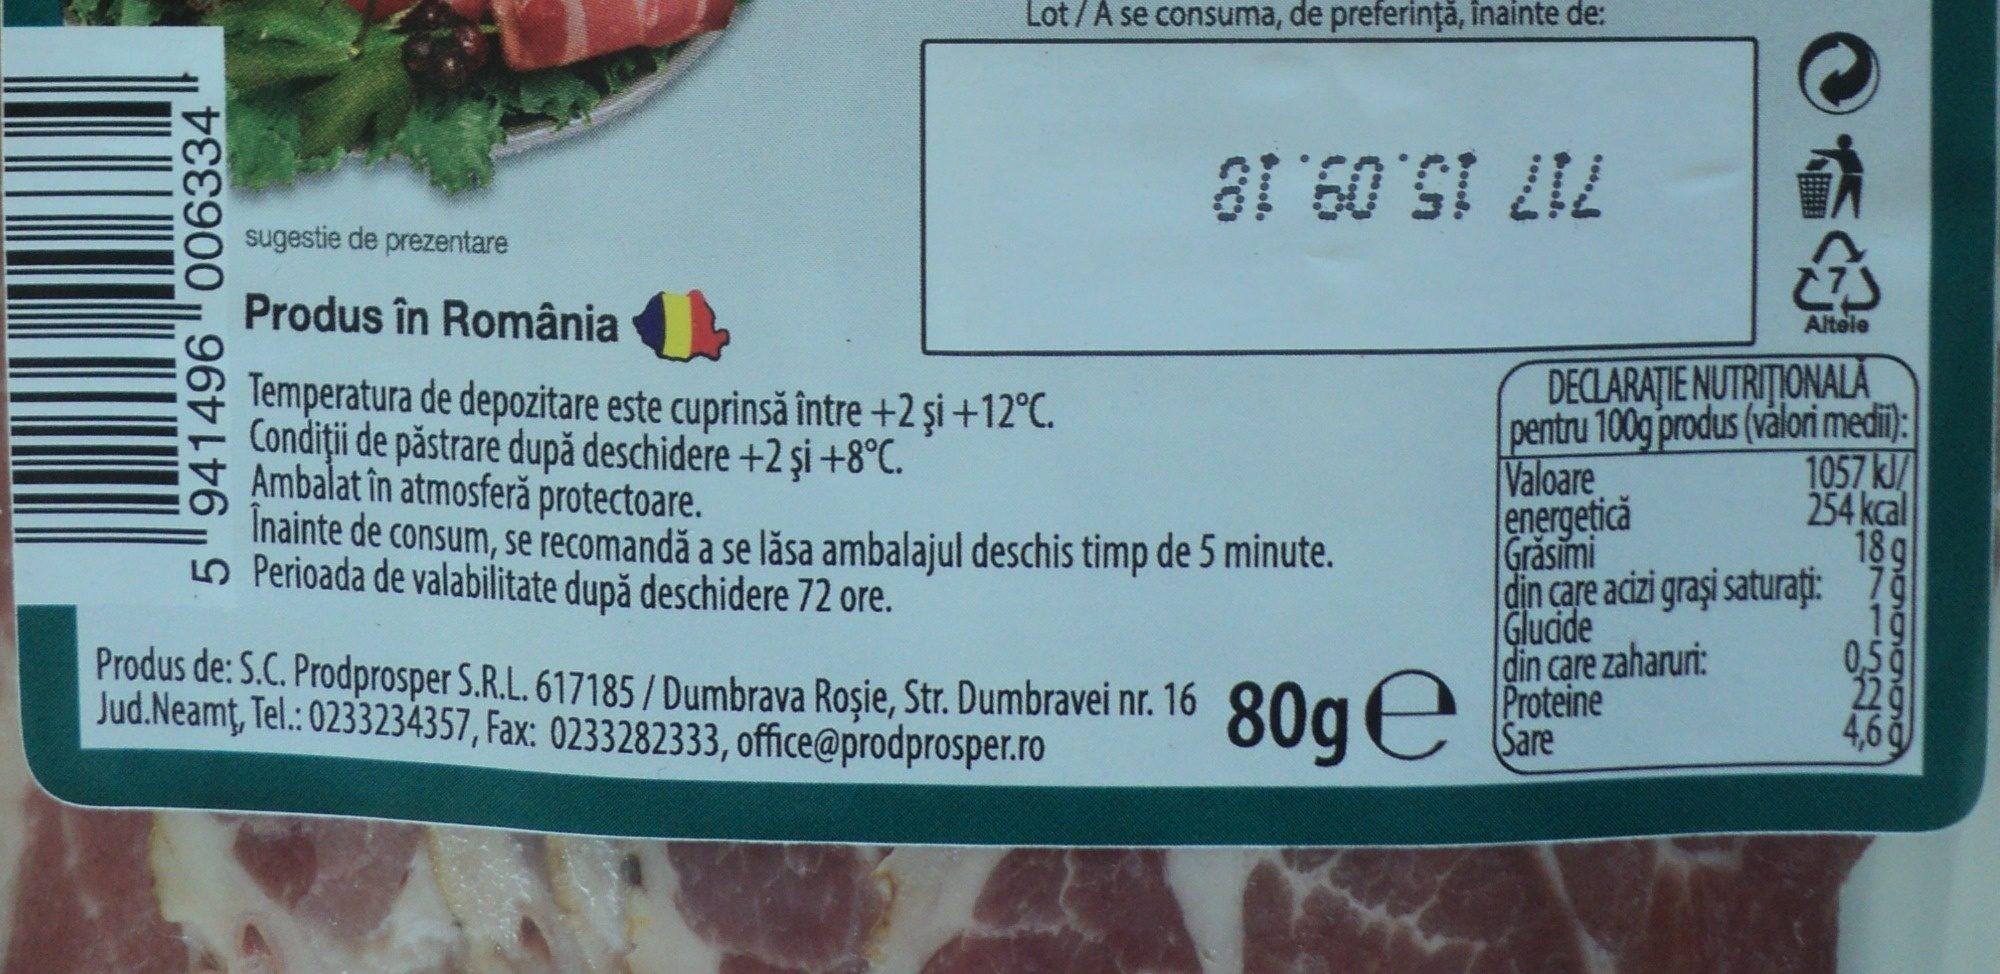 Premium Ceafa de porc crud uscata - Nutrition facts - ro